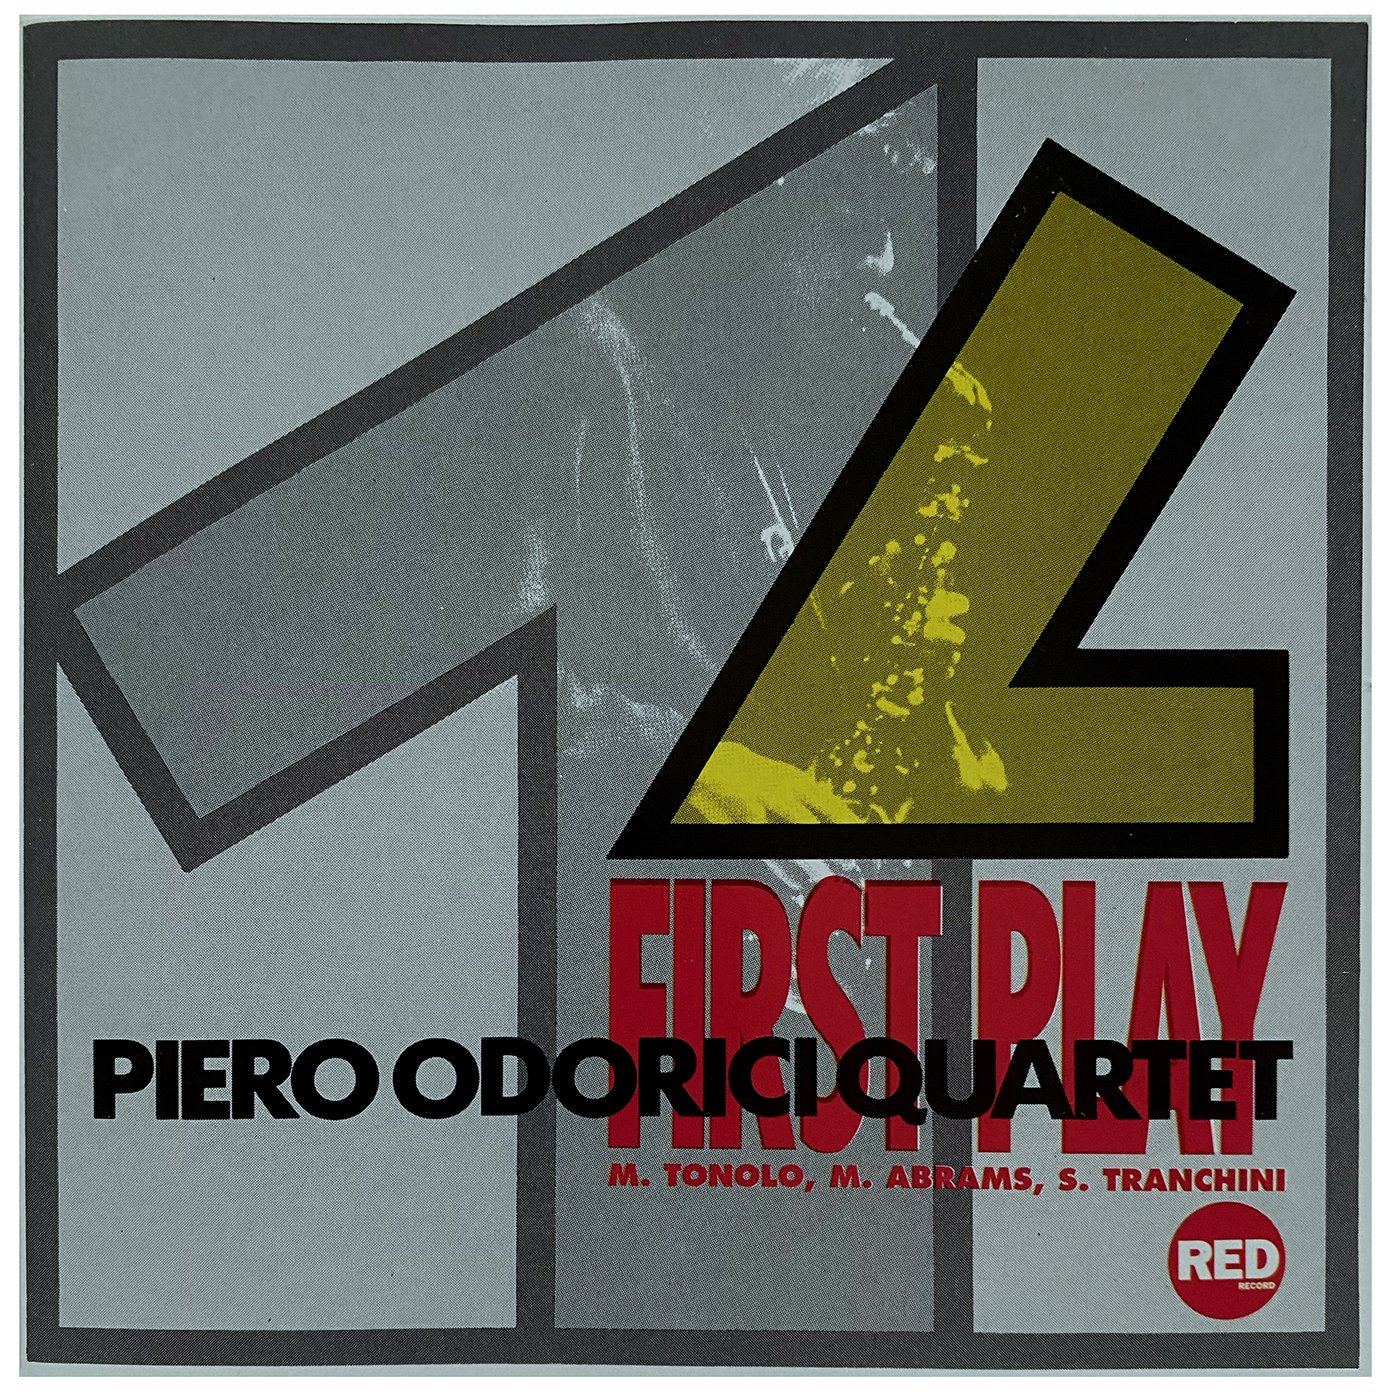 First Play - Piero Odorici Quartet